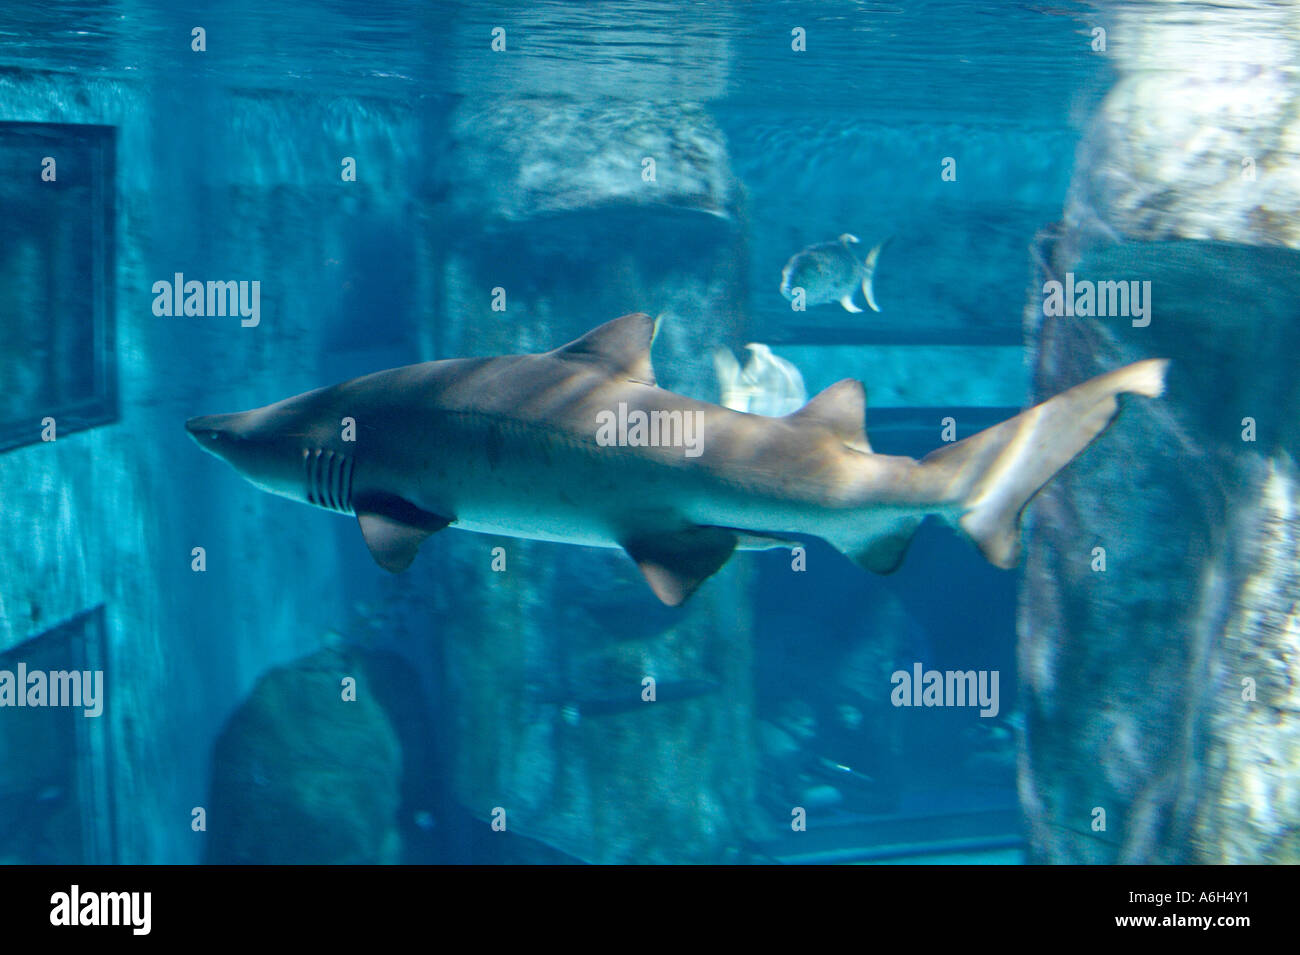 Fish in tank swimming - Sand Tiger Shark Odontaspis Taurus Fish Swimming In Tank In London Aquarium London Se1 England Uk